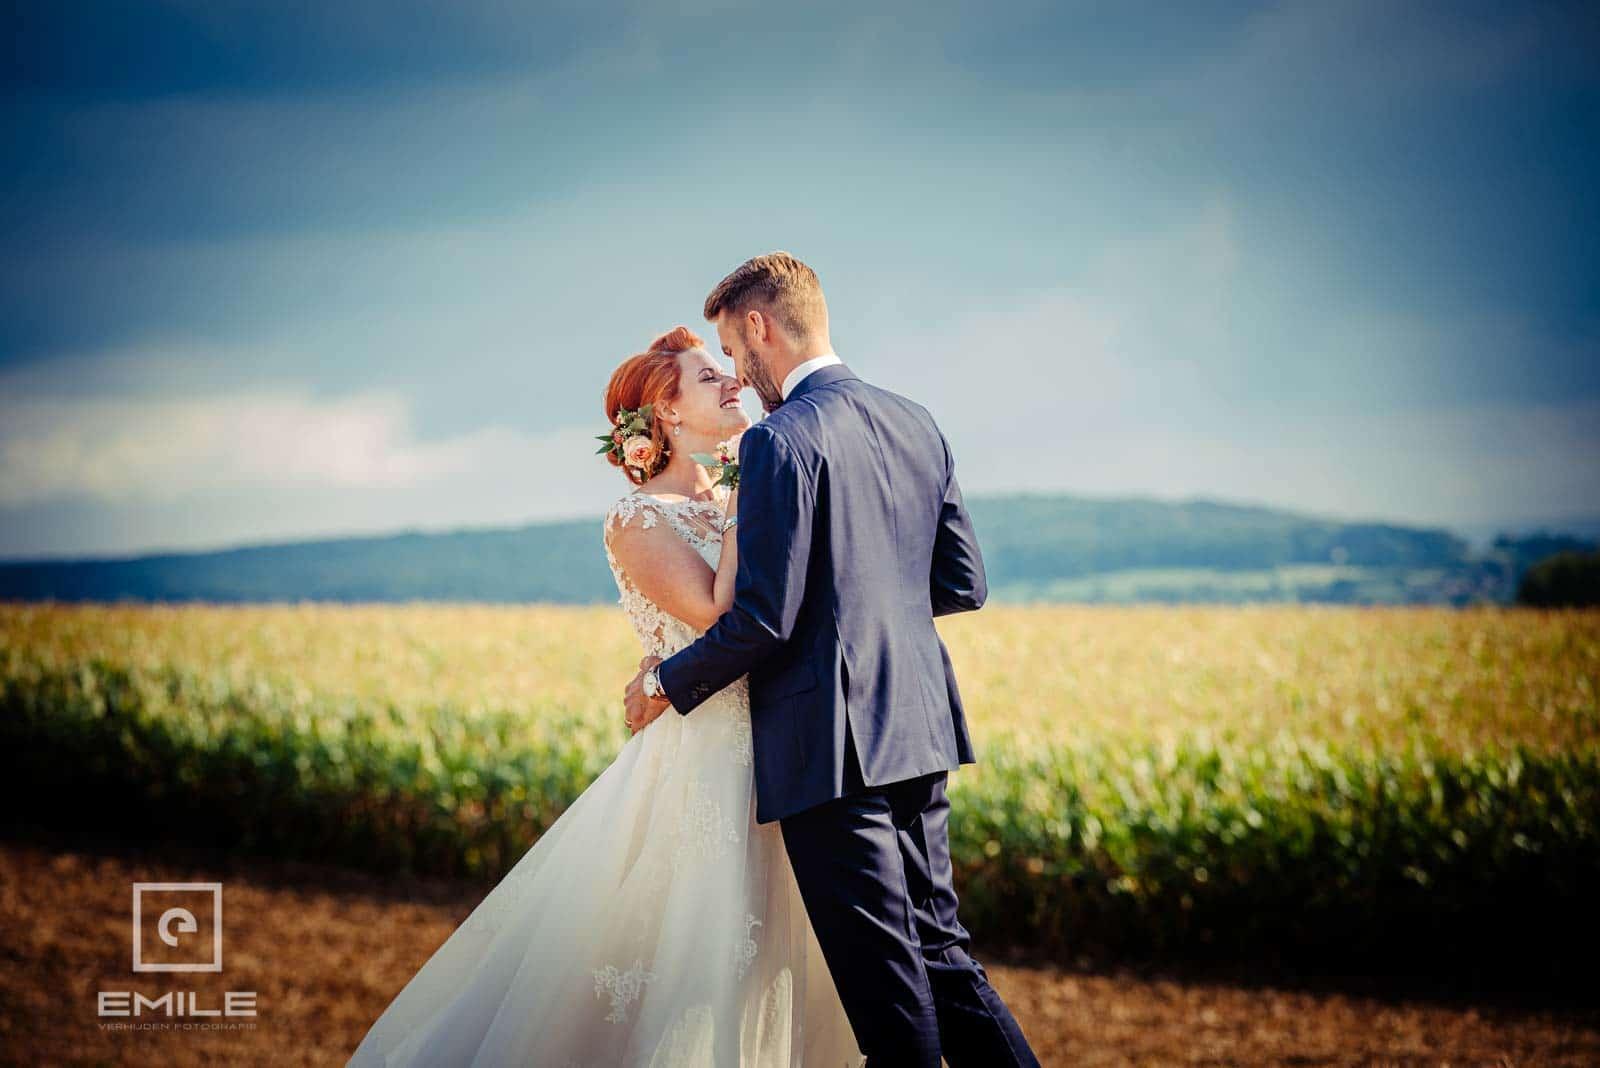 Samen knuffelen in het veld. Huwelijk Wylre Zuid-Limburg